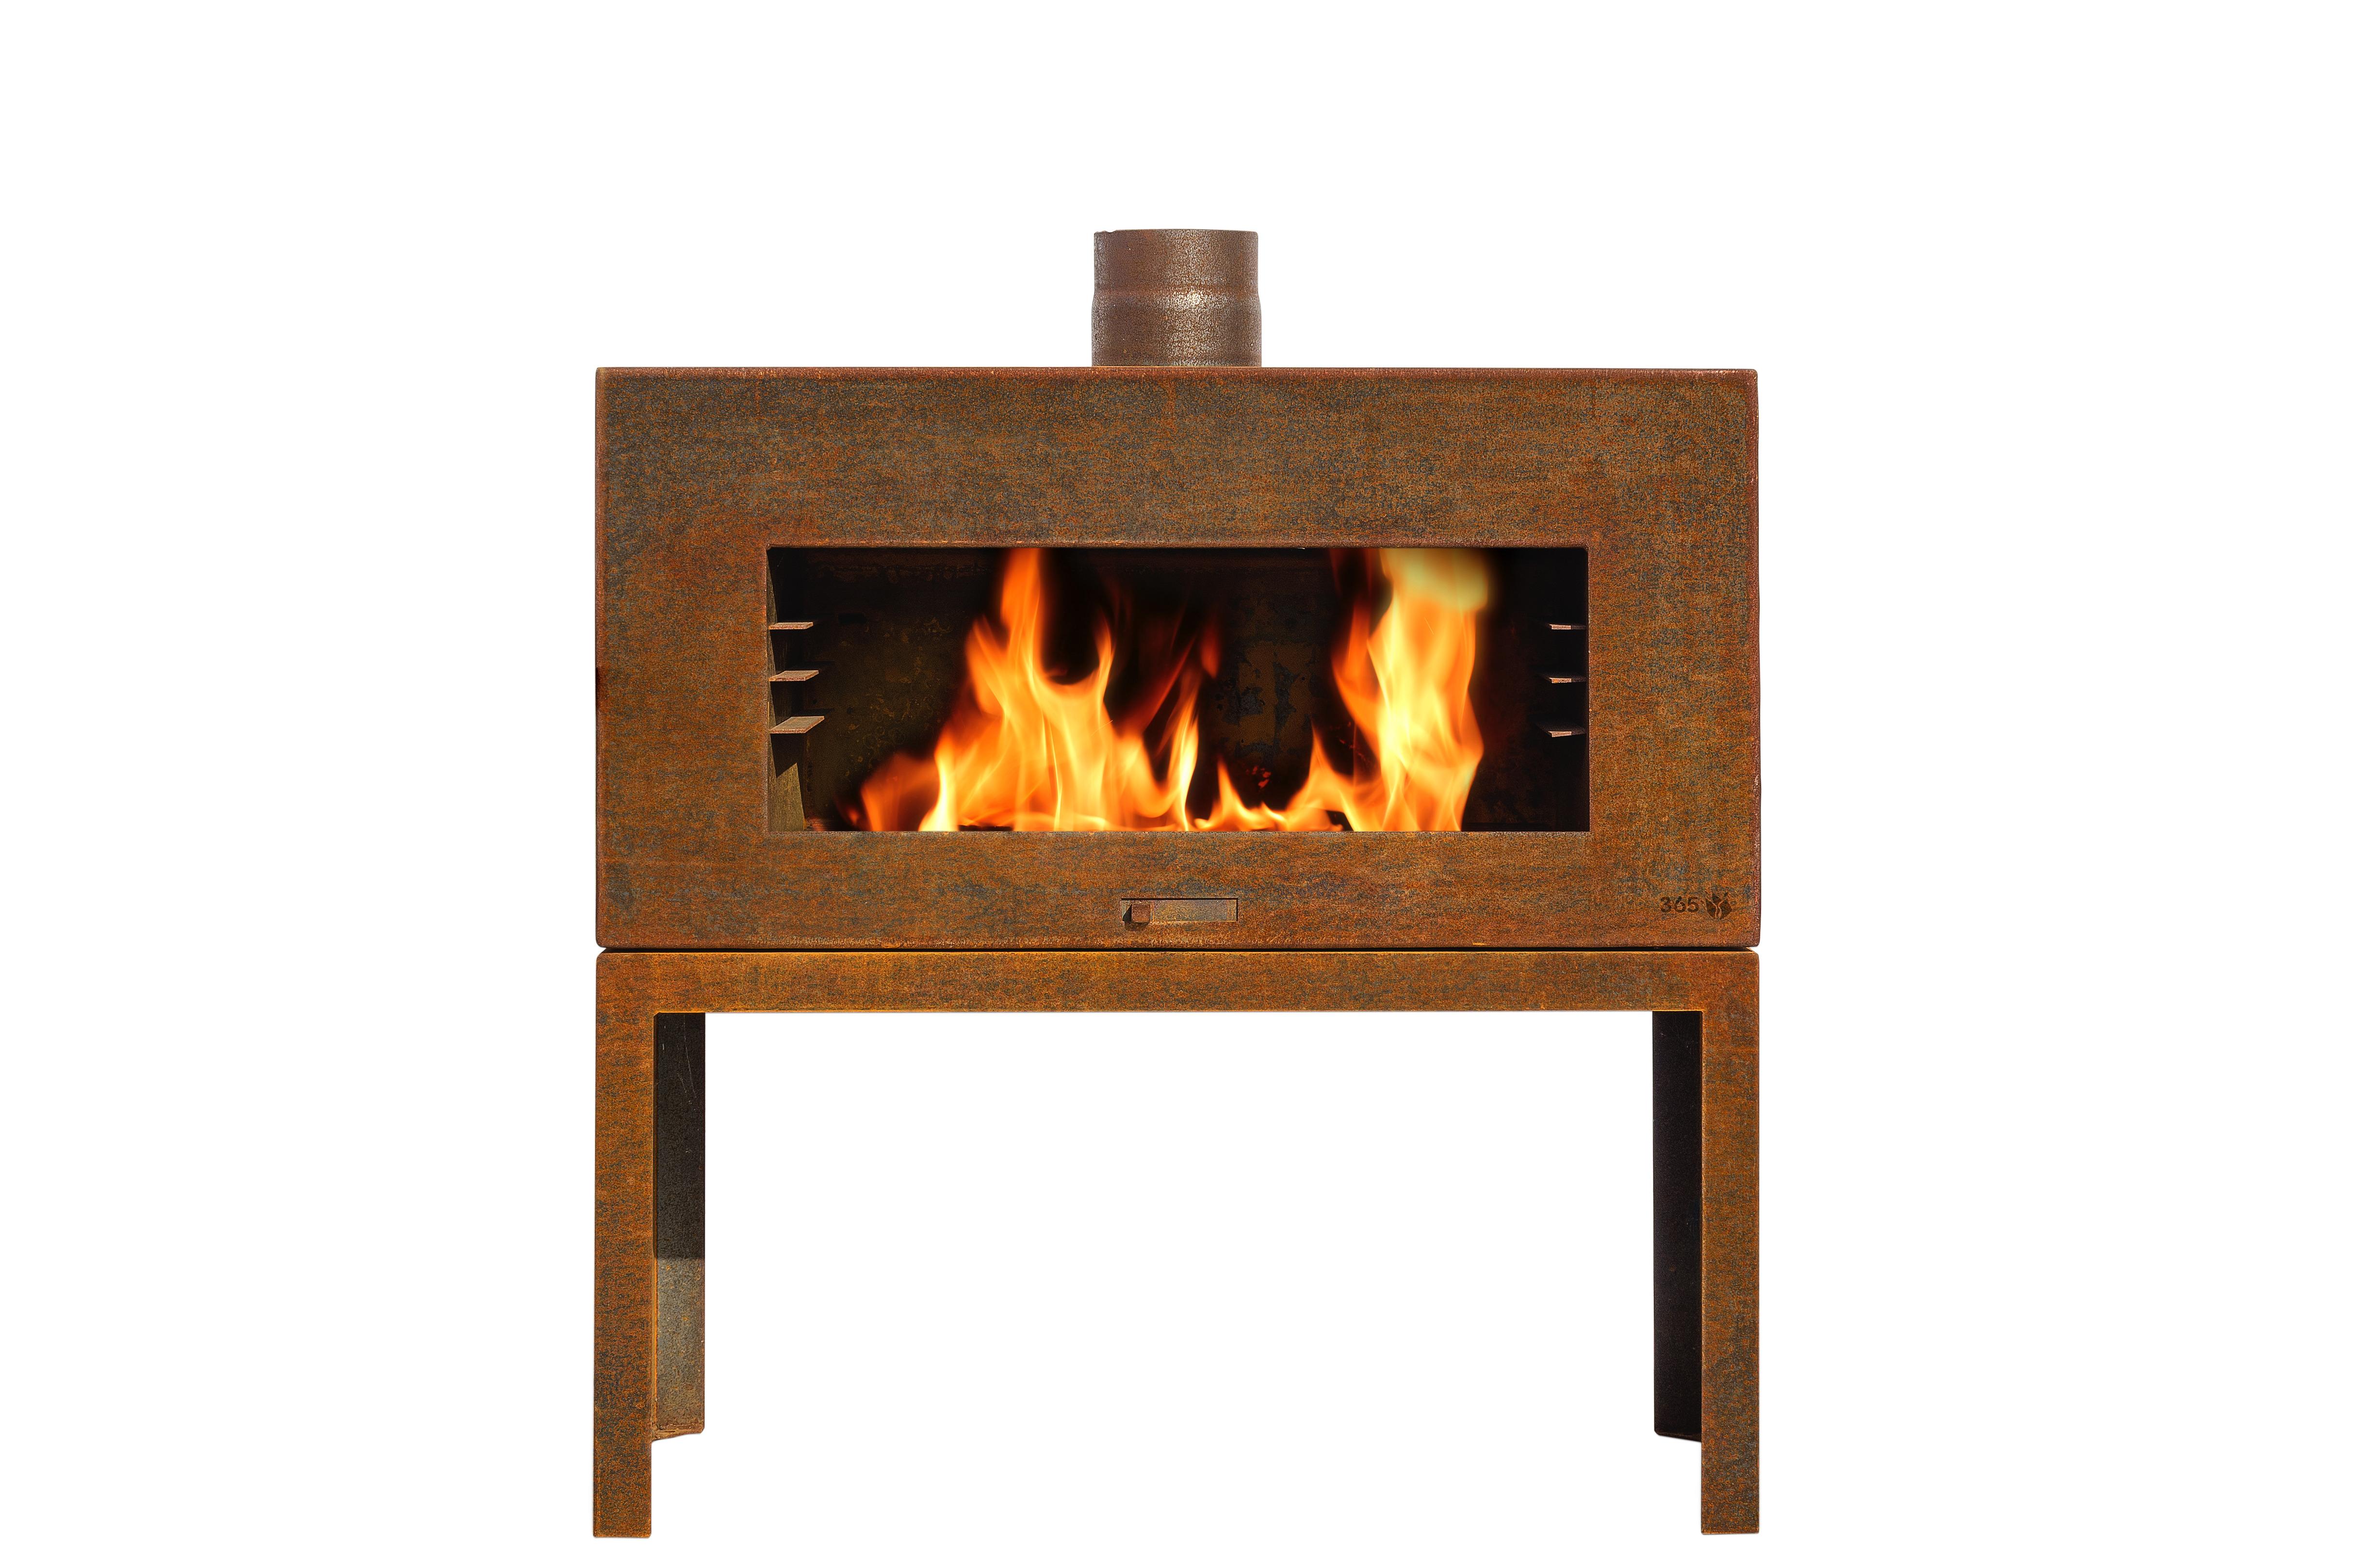 Terrassenofen Rost Stahl Tamina Feuercampus365 Kaufen Cafiro